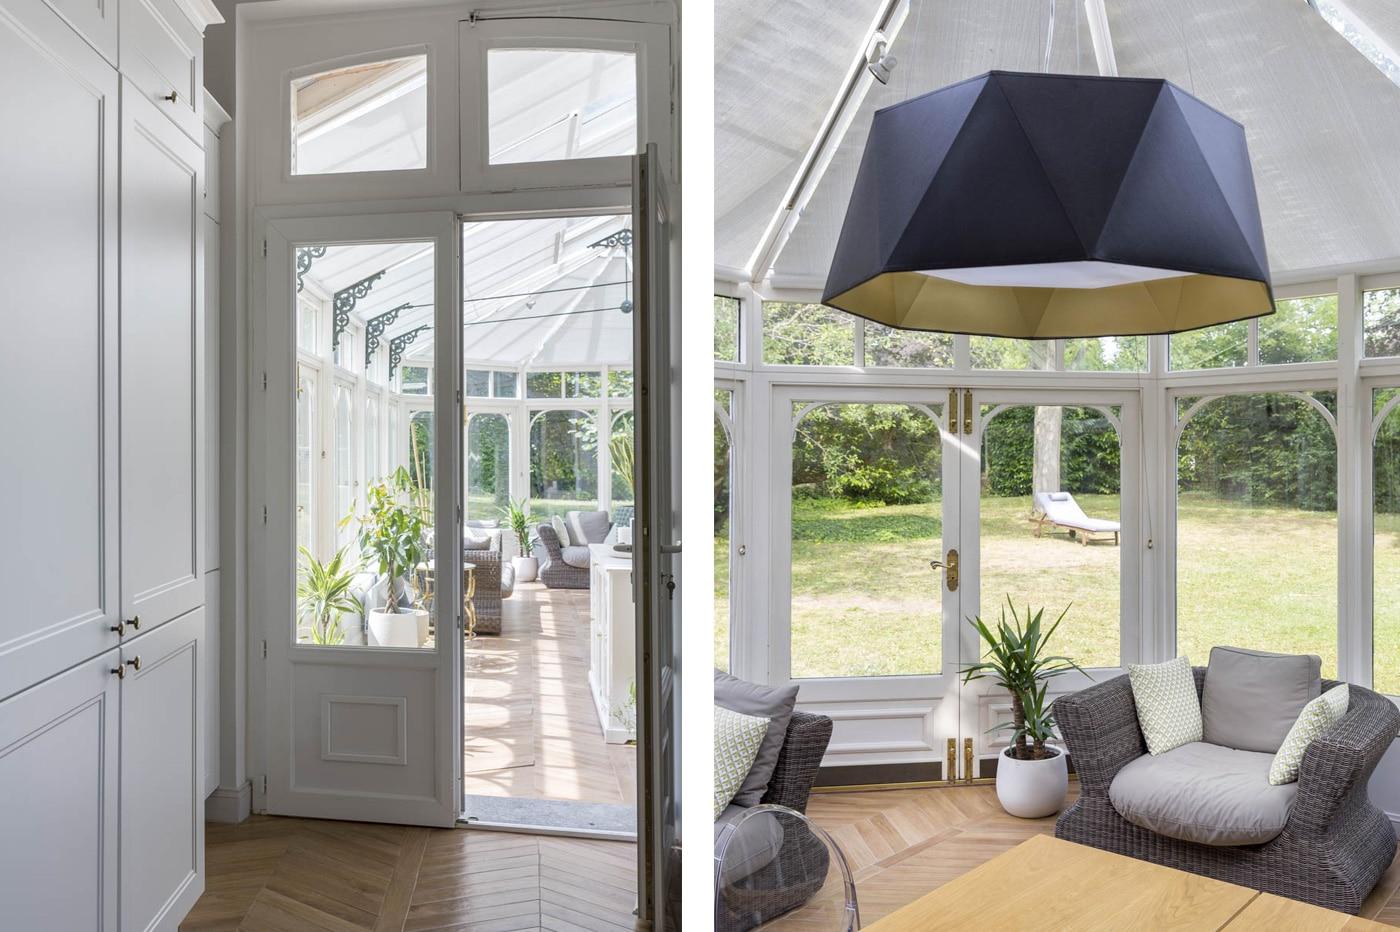 Villa scandinave - Yvelines Paris